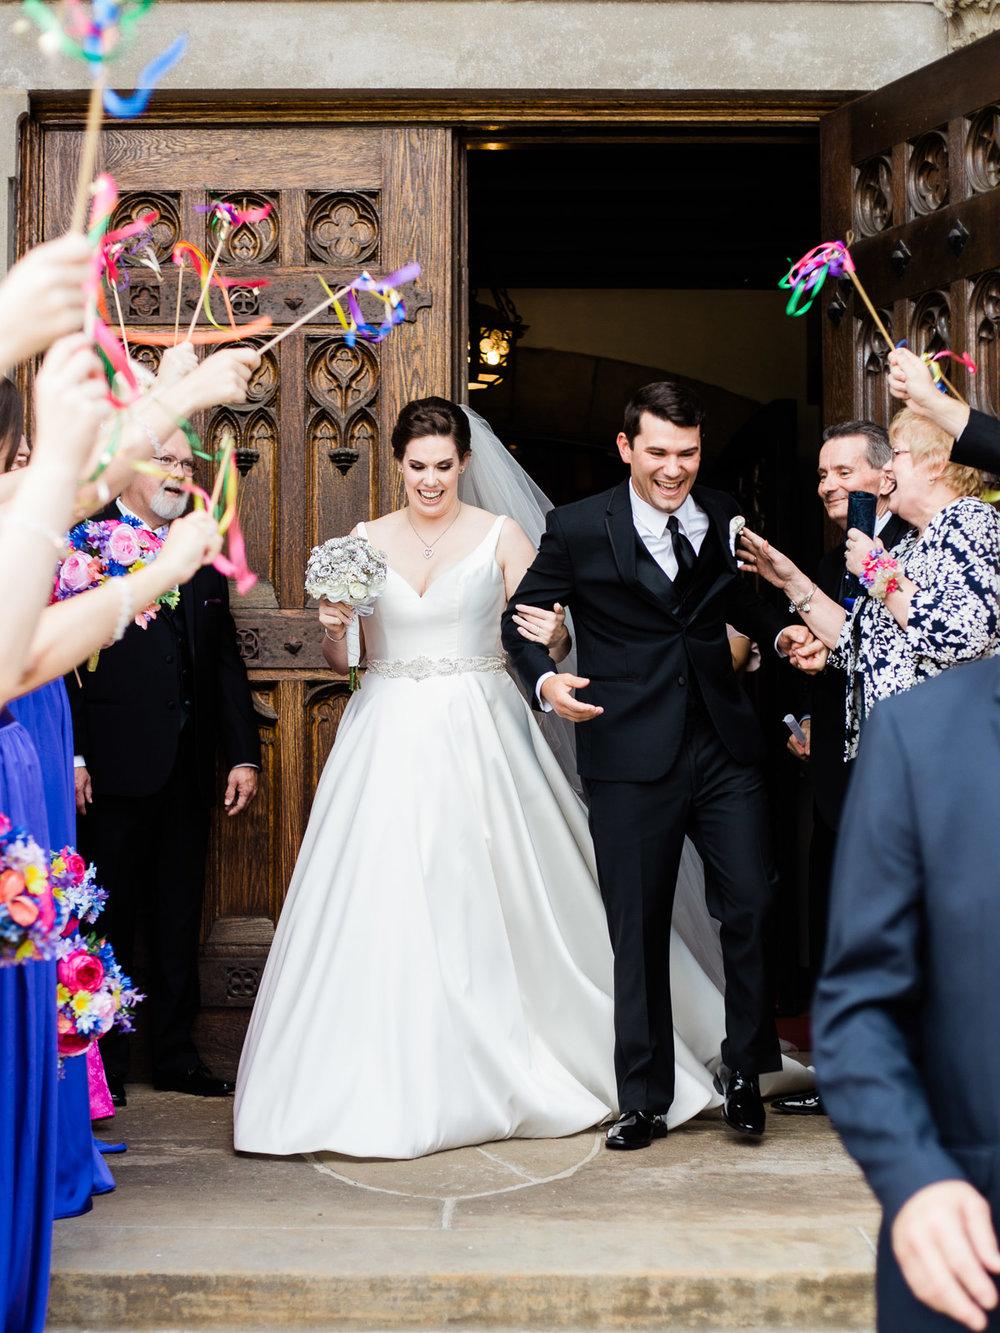 vibrant-tangier-akron-wedding-photos-by-matt-erickson-photography-12.jpg